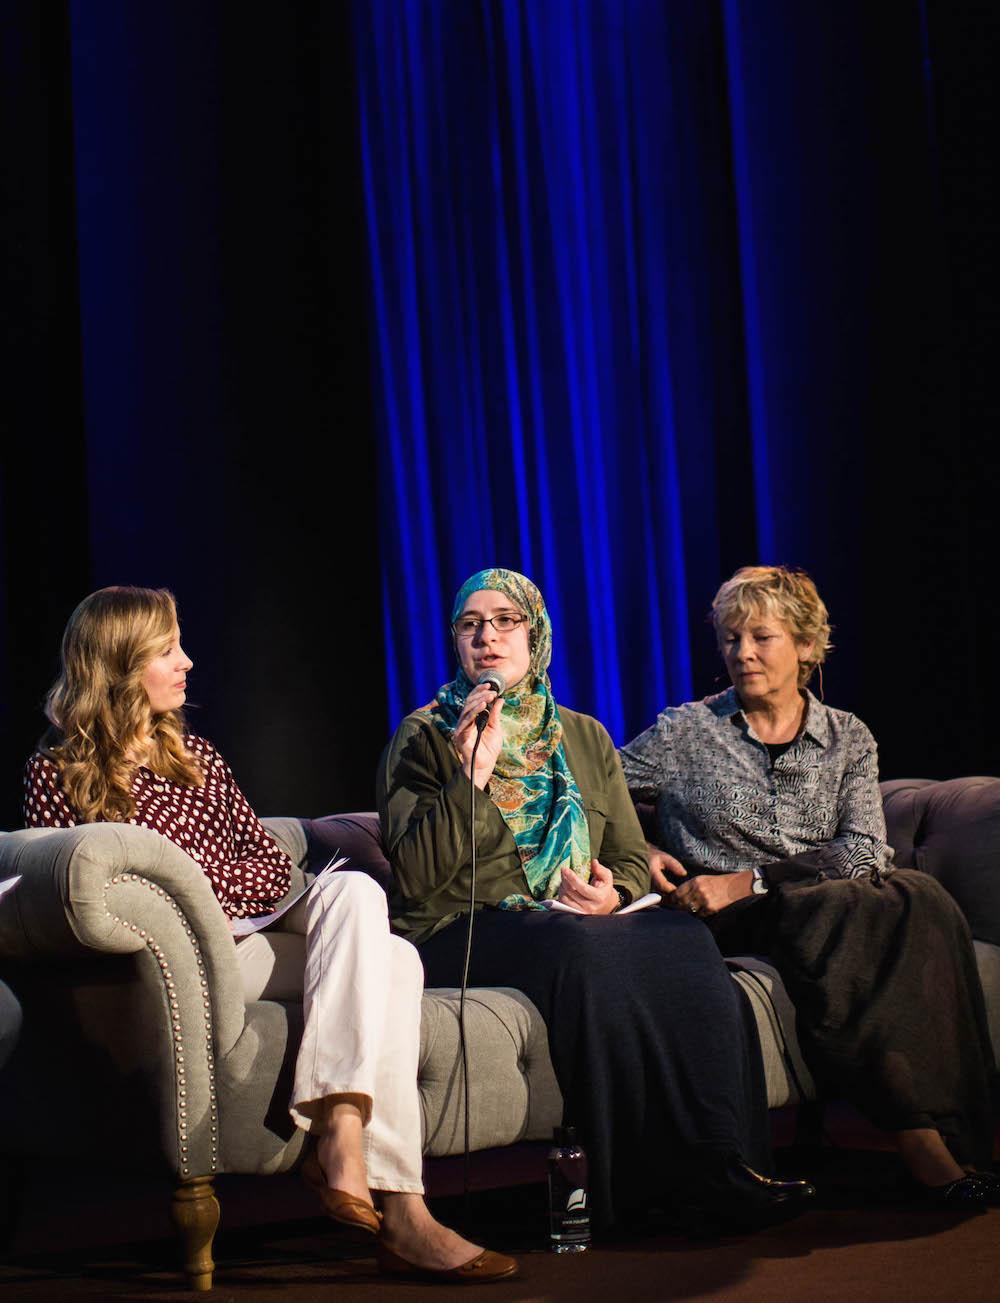 Muslim - Christian Dialogue